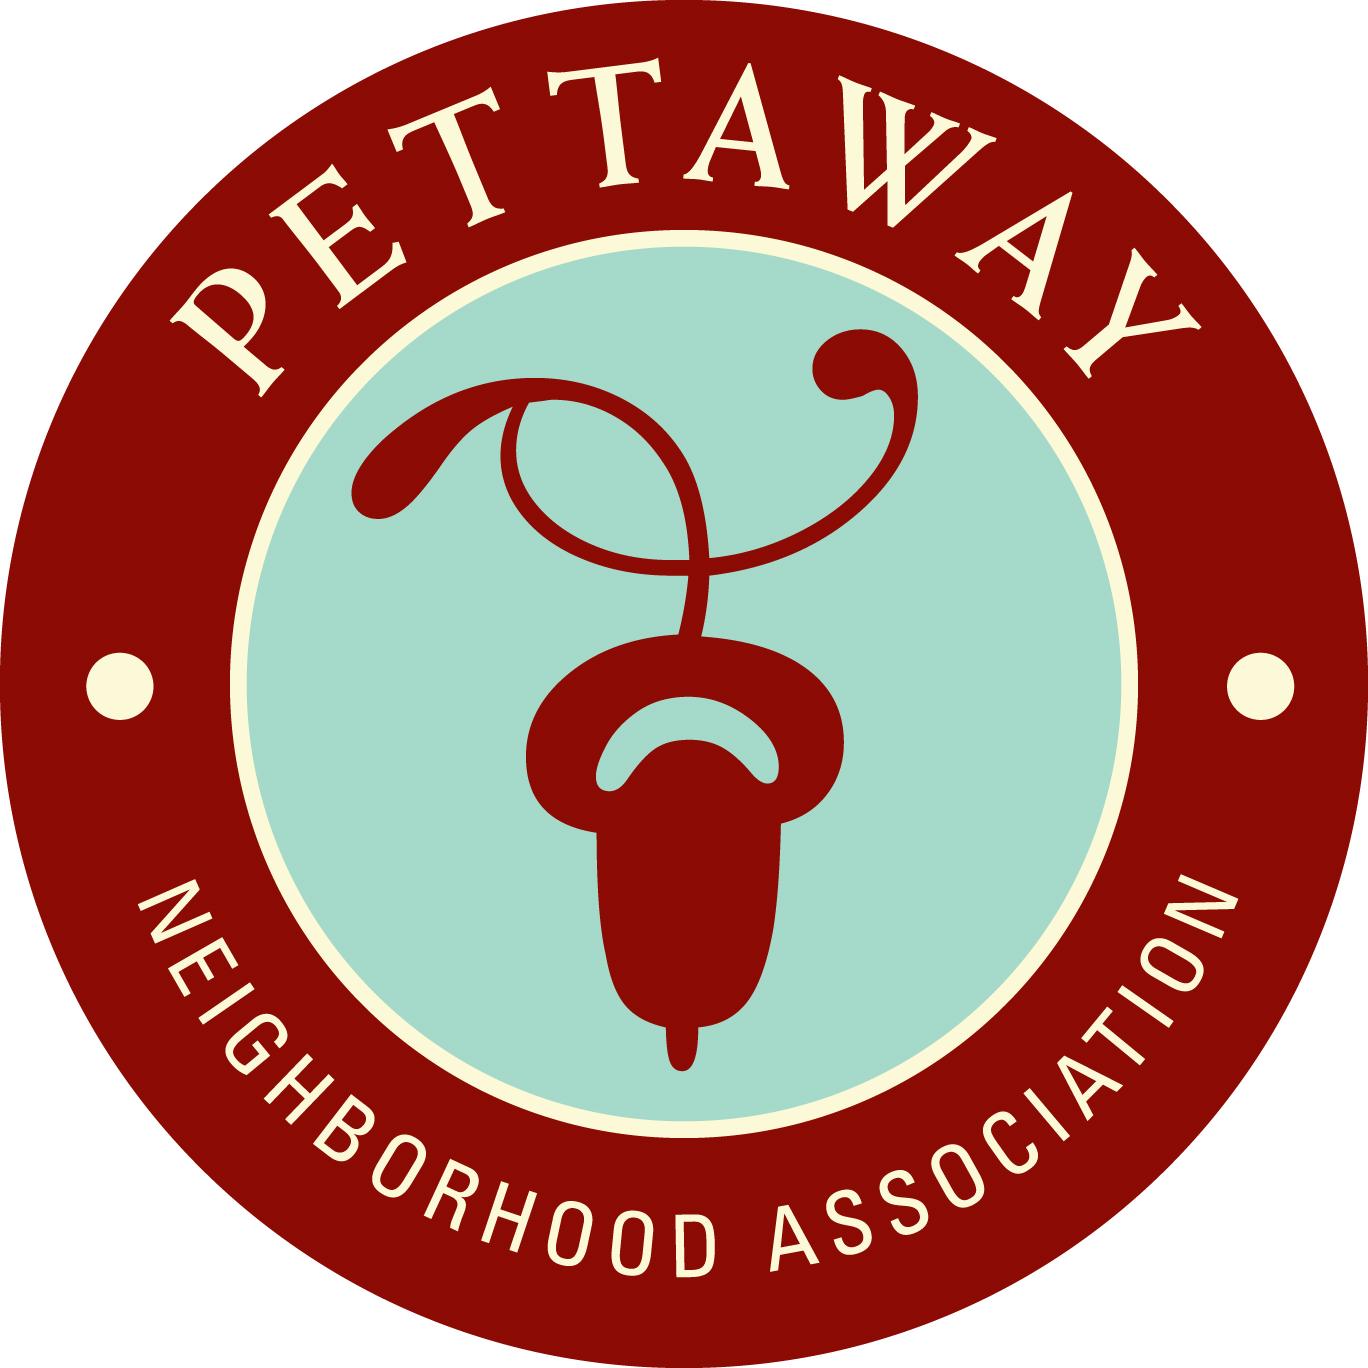 City Of Little Rock Pettaway Neighborhood Association